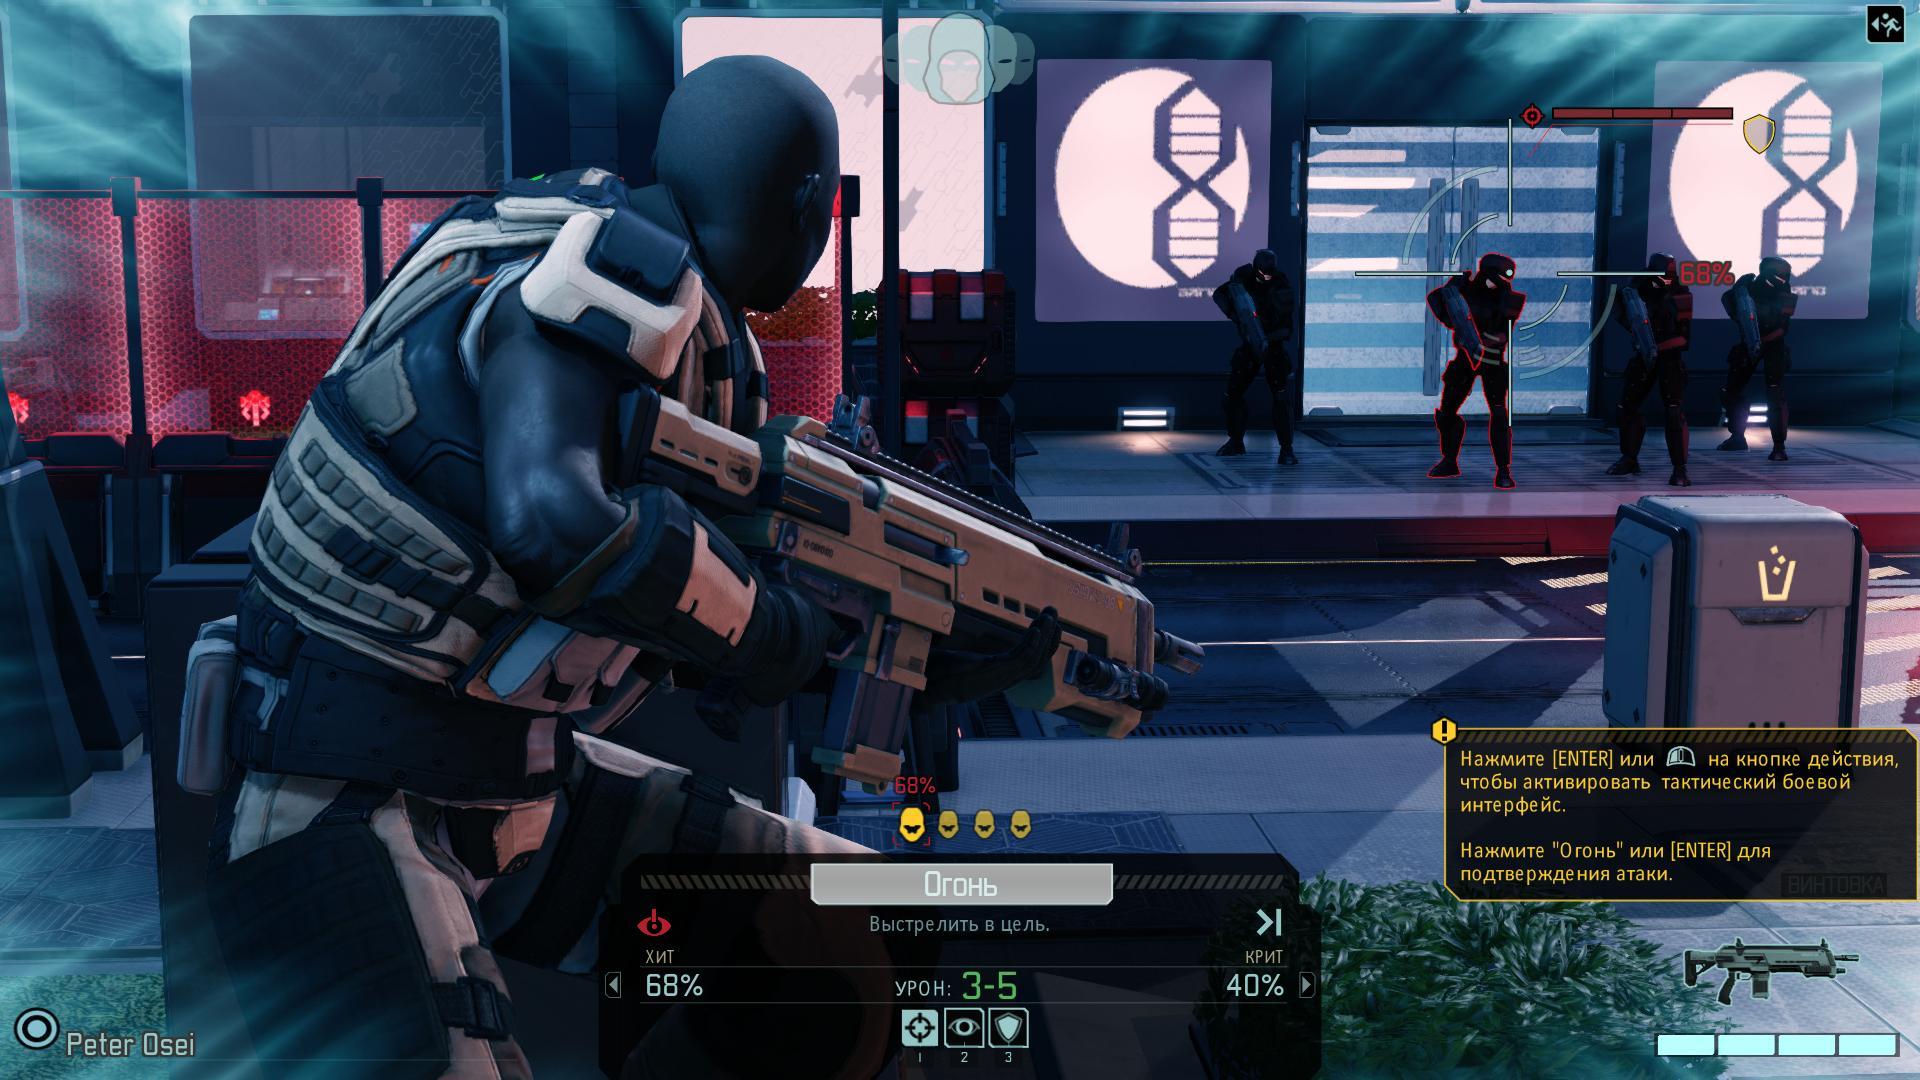 Скриншот к игре XCOM 2: Digital Deluxe Edition + Long War 2 [Update 9 + 6 DLC] (2016) PC | RePack от R.G. Механики